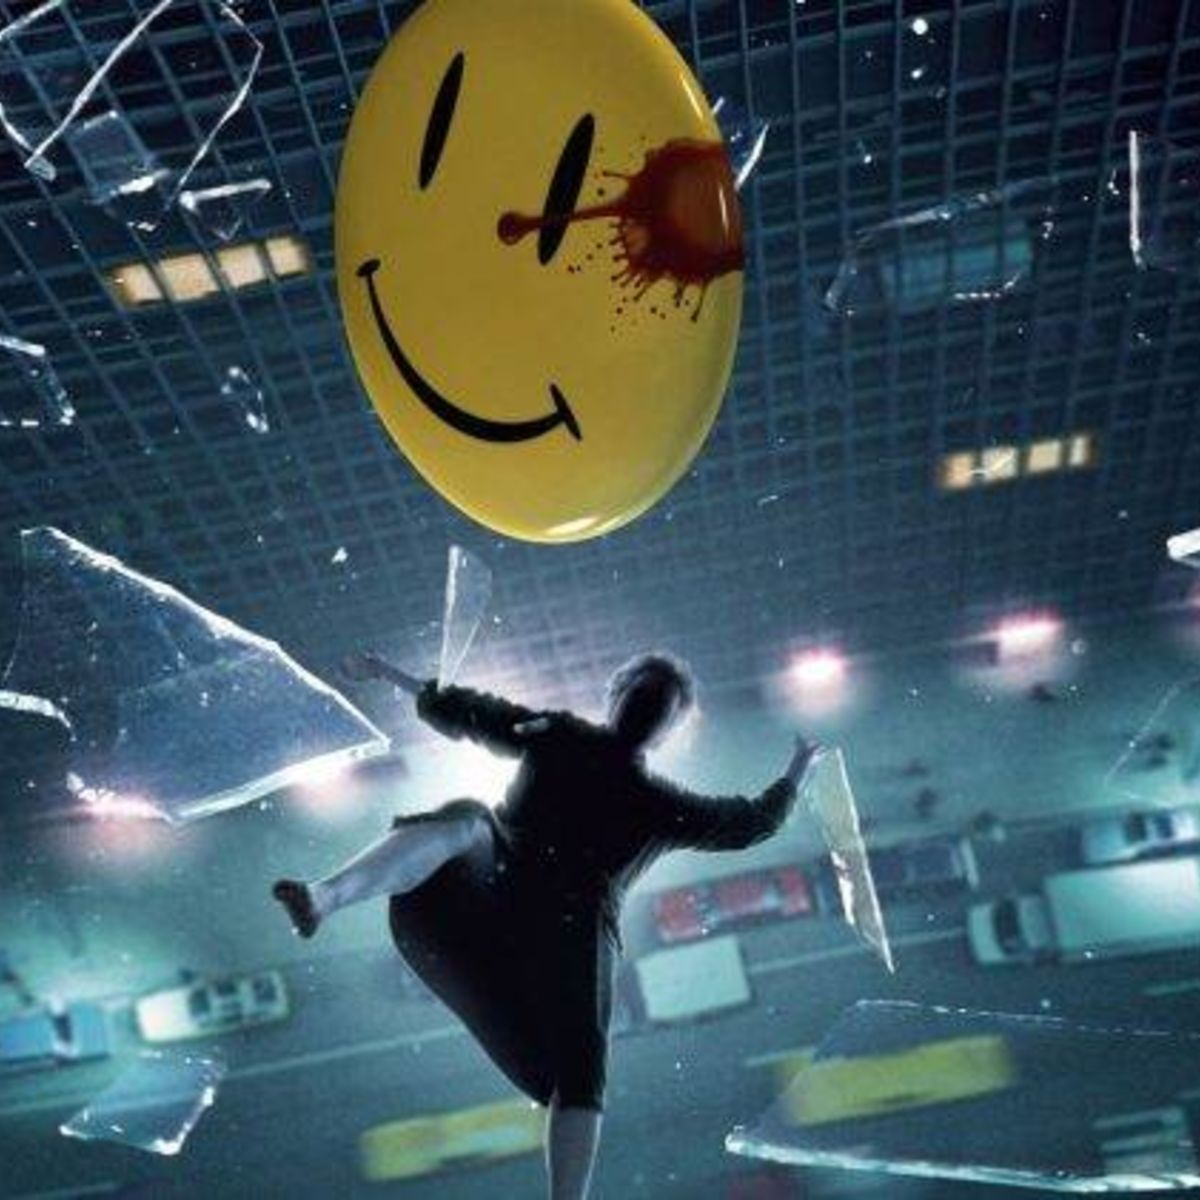 54126-movies-Watchmen-Jeffrey_Dean_Morgan-Edward_Blake-The_Comedian-falling-broken_glass-smiley-748x421.jpg